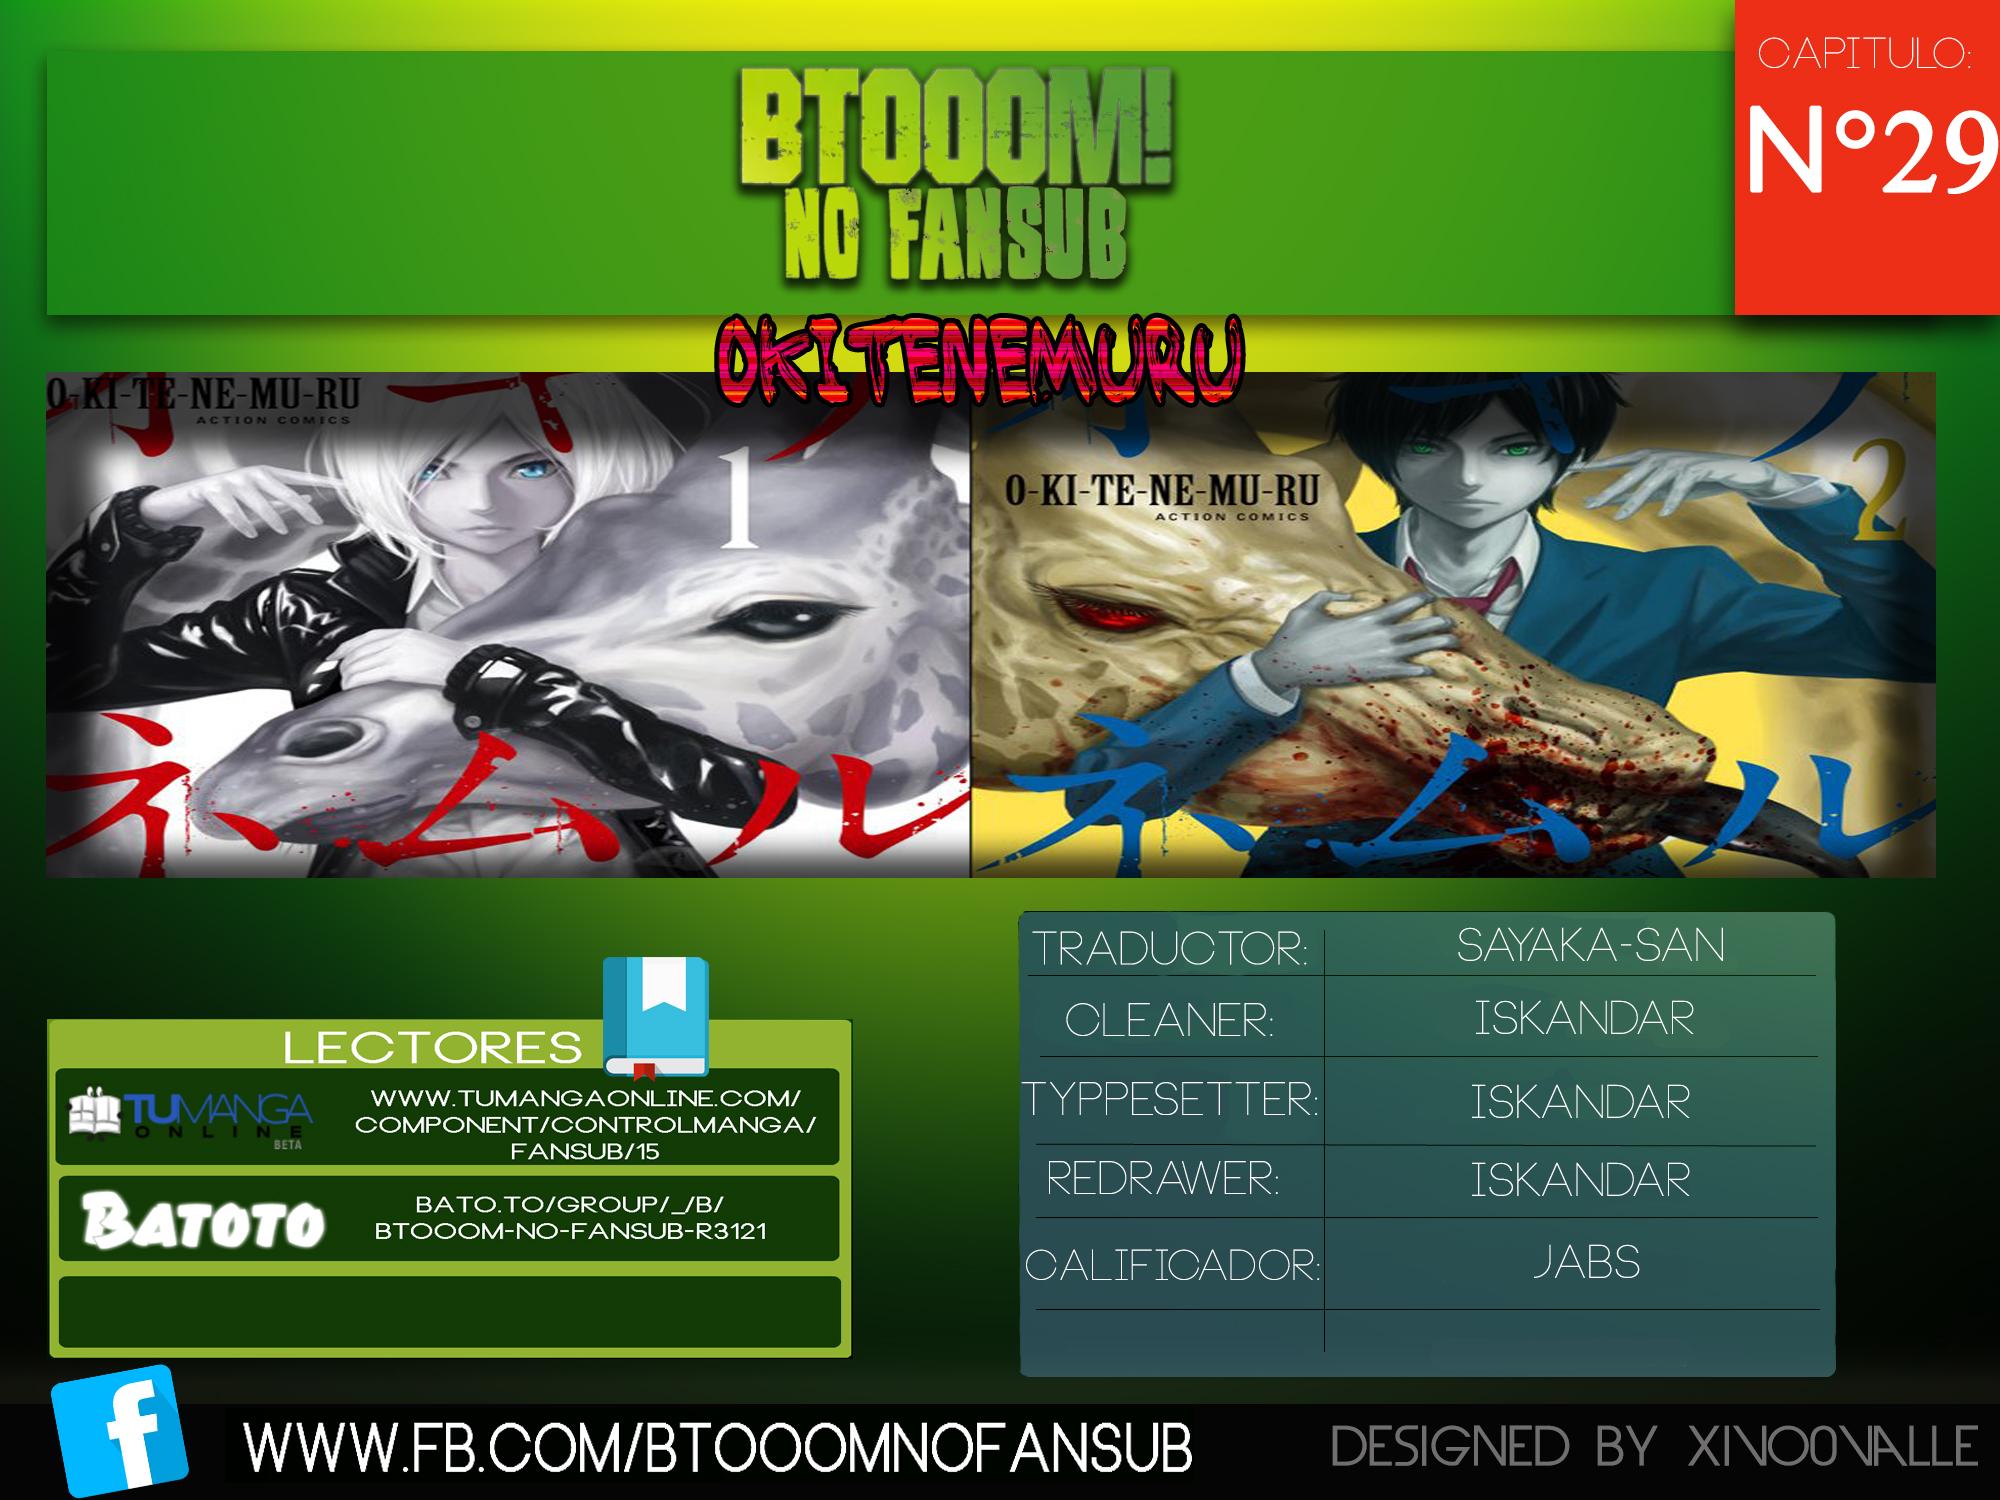 http://c5.ninemanga.com/es_manga/54/16310/421666/78fecb8c5f3b76606ab1d6d25a749385.jpg Page 1